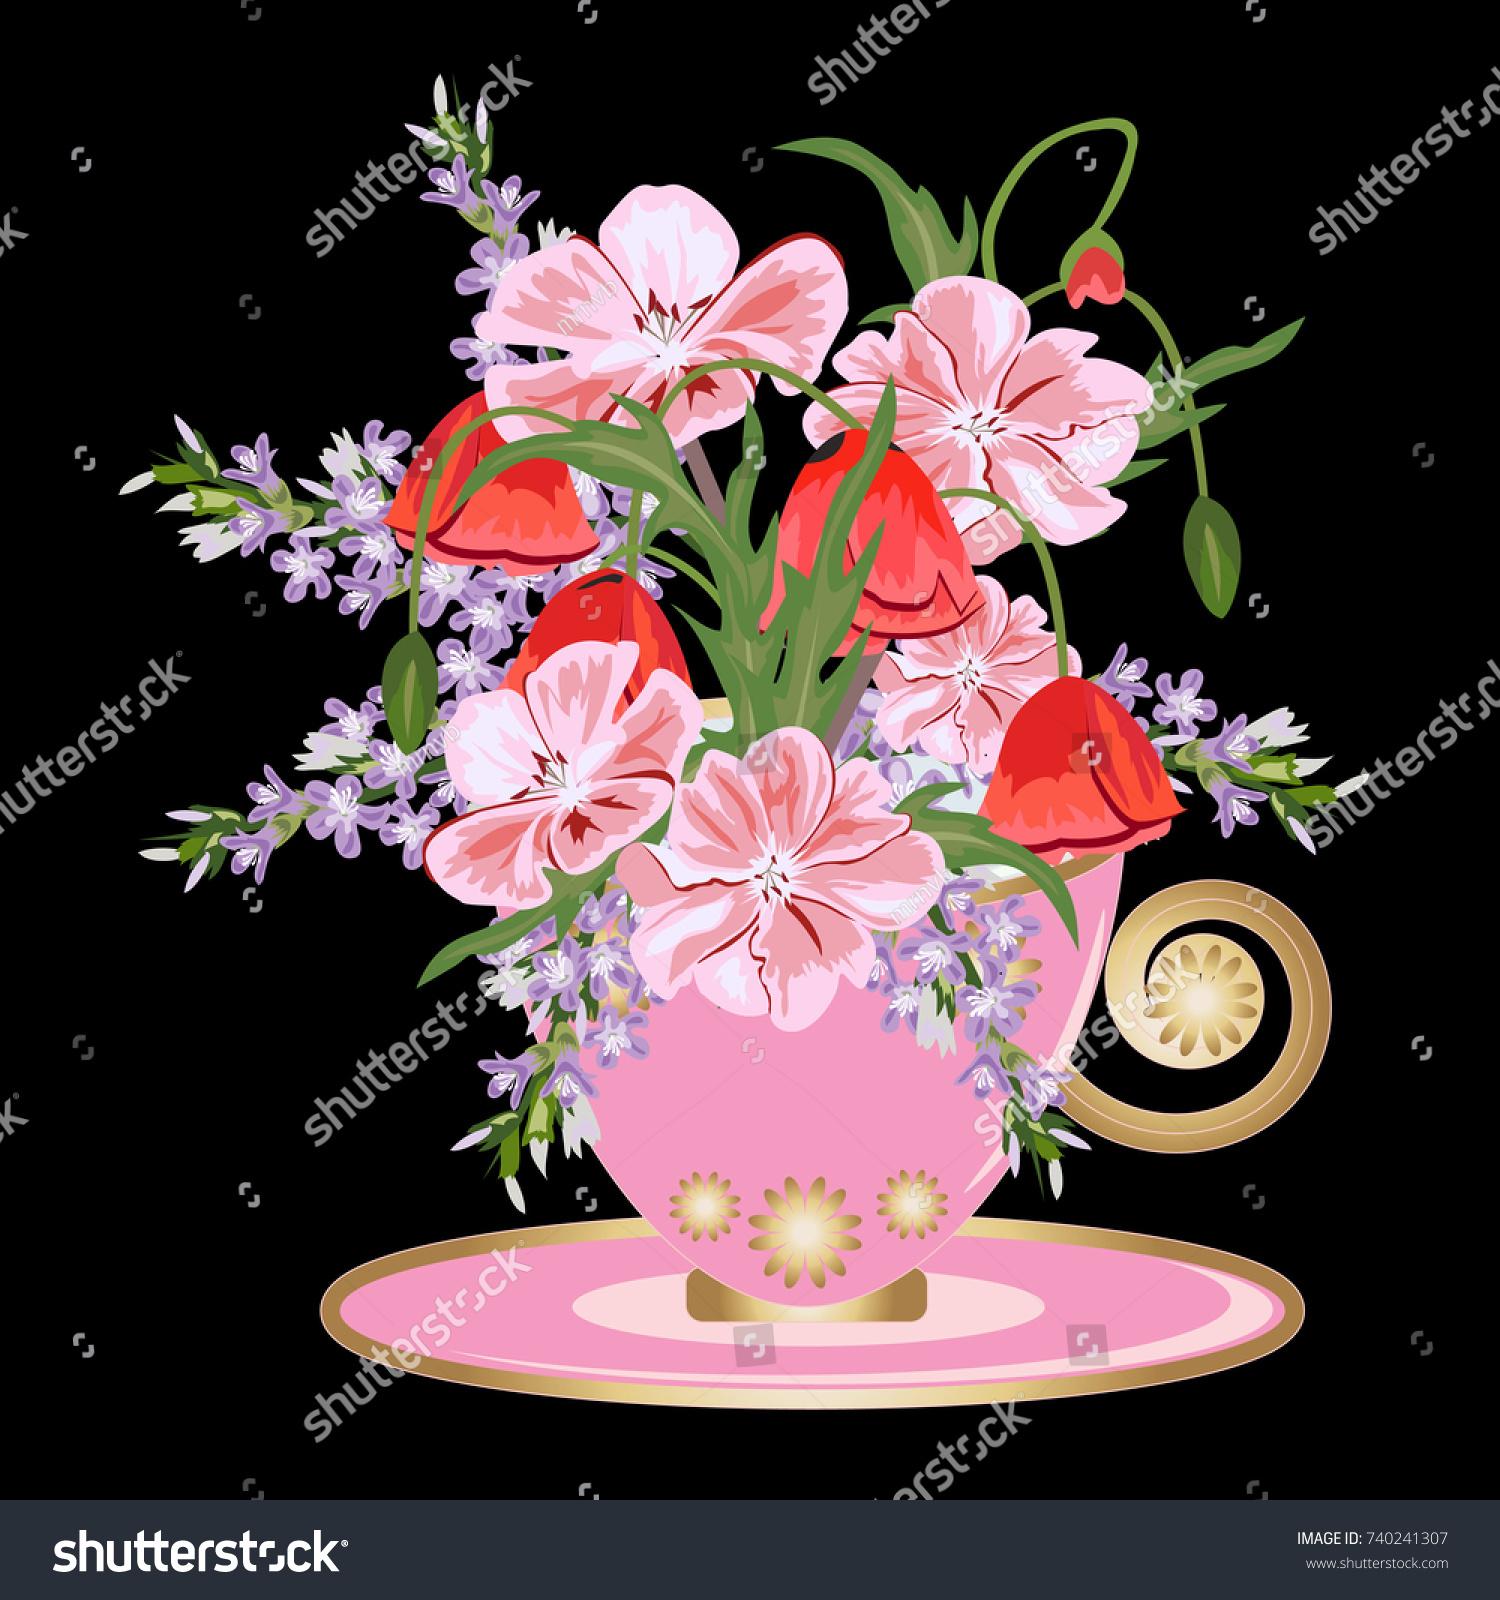 Beautiful Bouquet Meadow Flowers Vintage Pink Stock Illustration ...